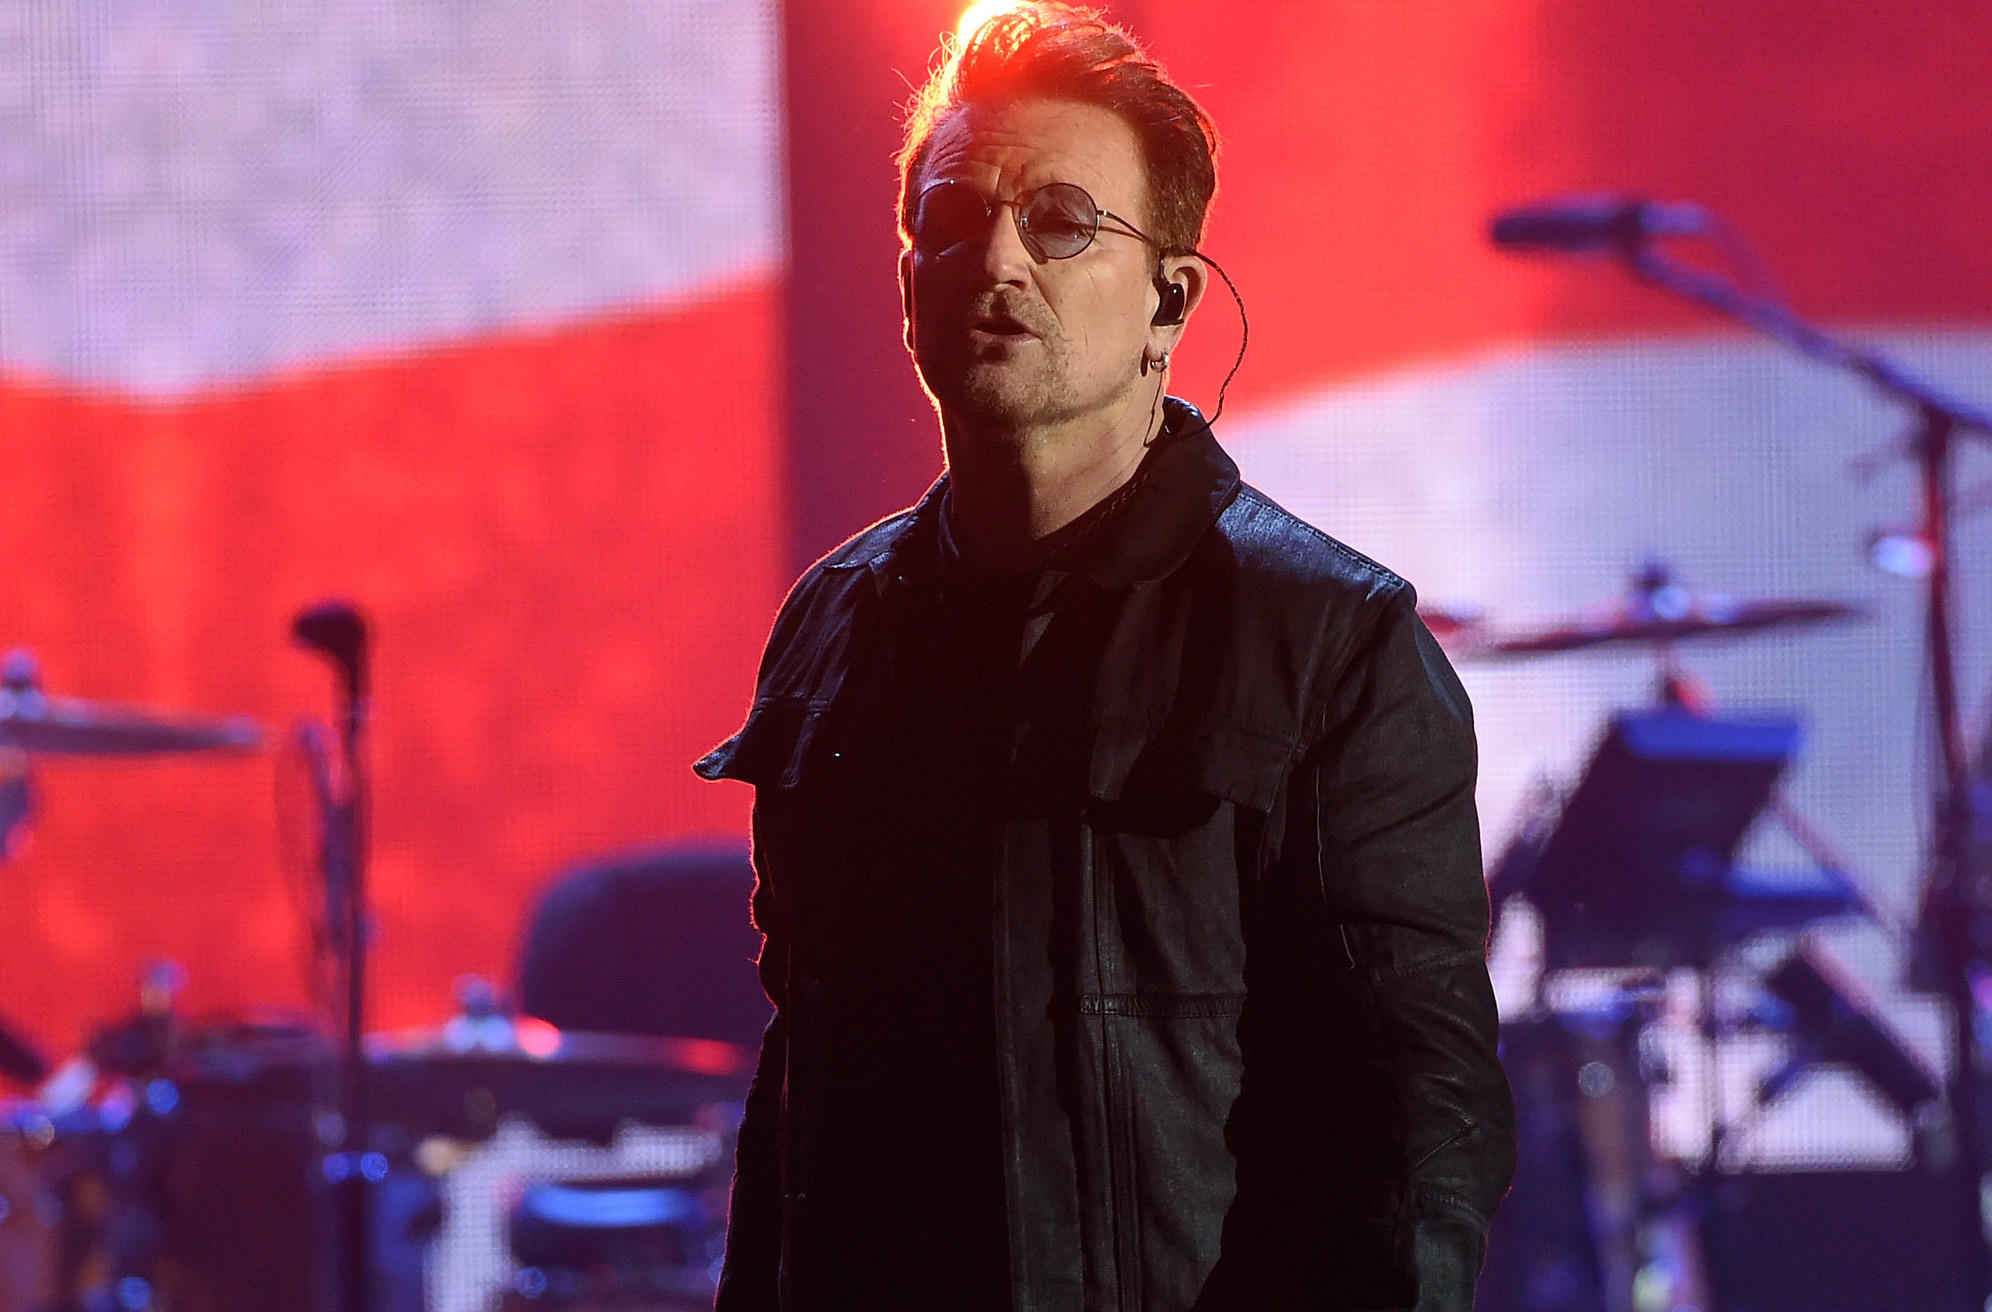 - The Joshua Tree Tour 2020  Lucas Oil Stadium  September 10 U2 adds 12 more dates to Joshua Tree tour   CBS News